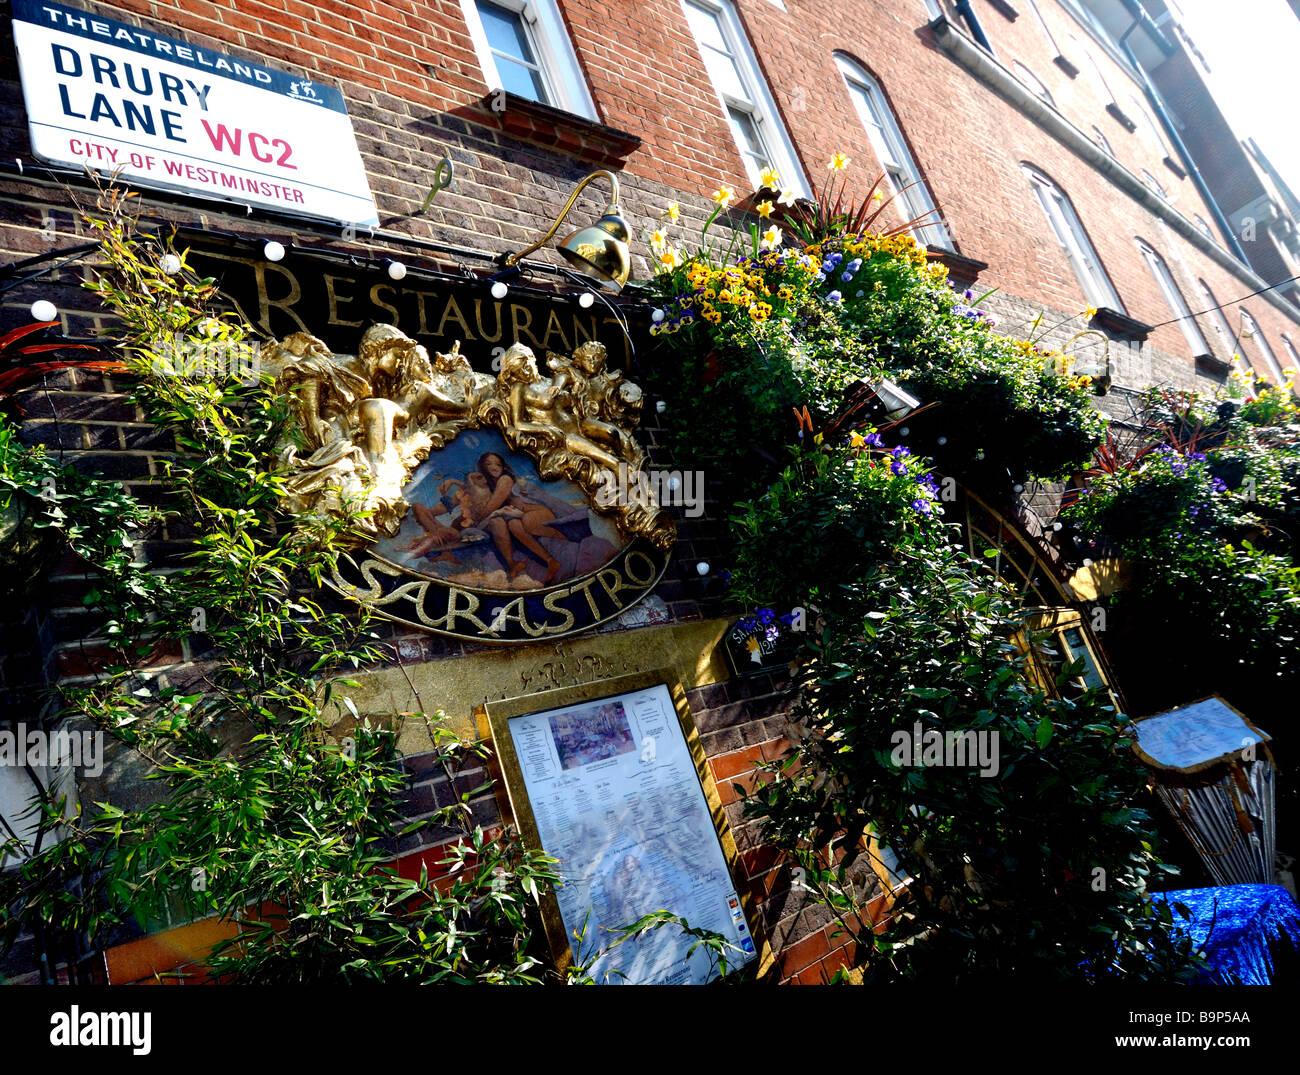 Sarastro restaurant exterior, Drury lane, London - Stock Image